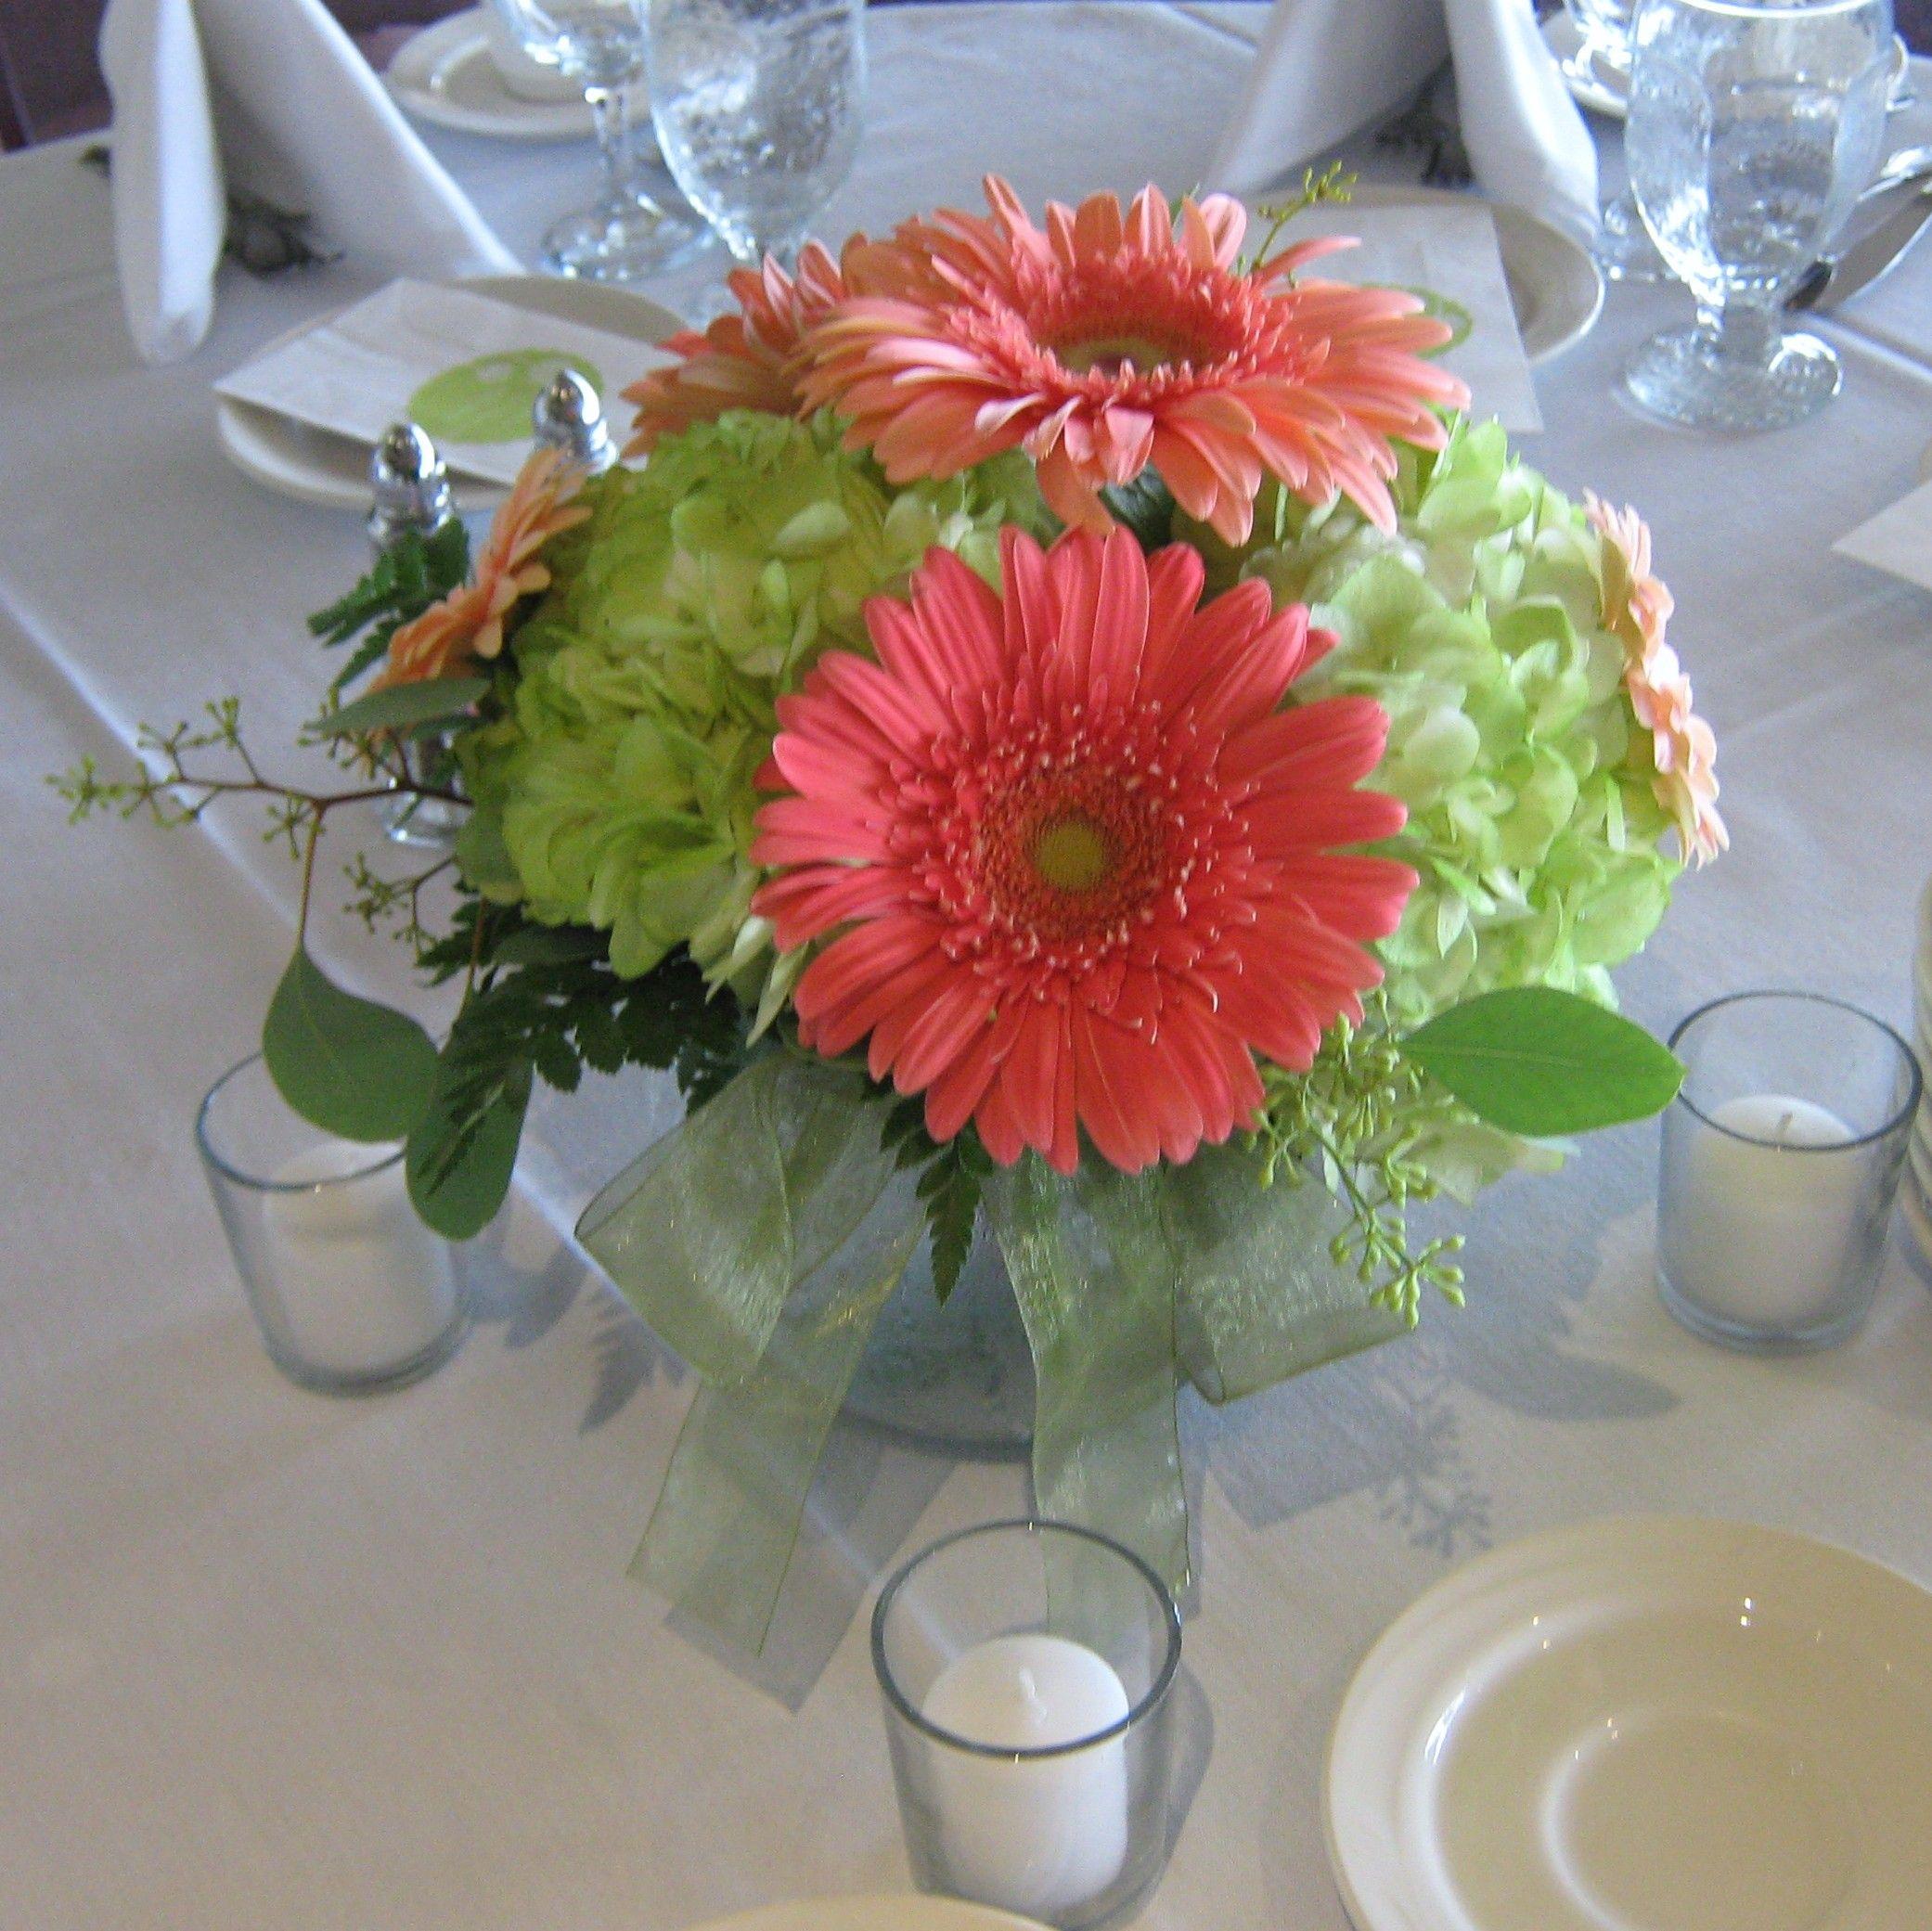 Gerbera Daisy Wedding Centerpieces | Buffalo Wedding Flowers ...